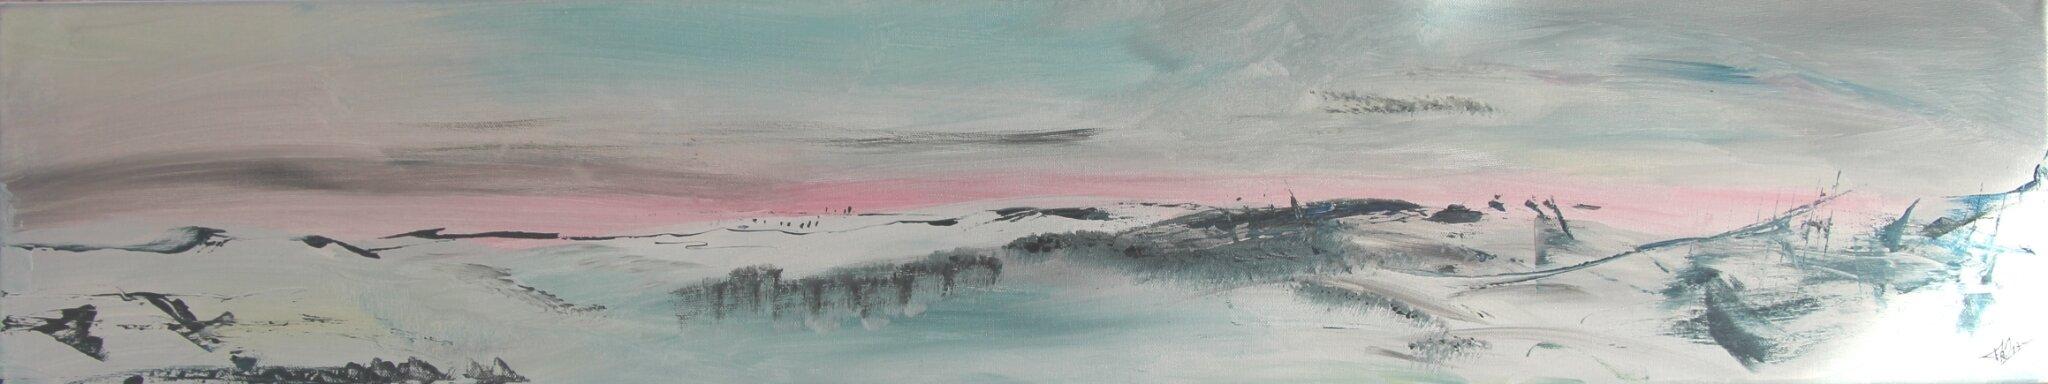 Nouvelle neige- acryl 2017- 100 X20cm- (n°112)